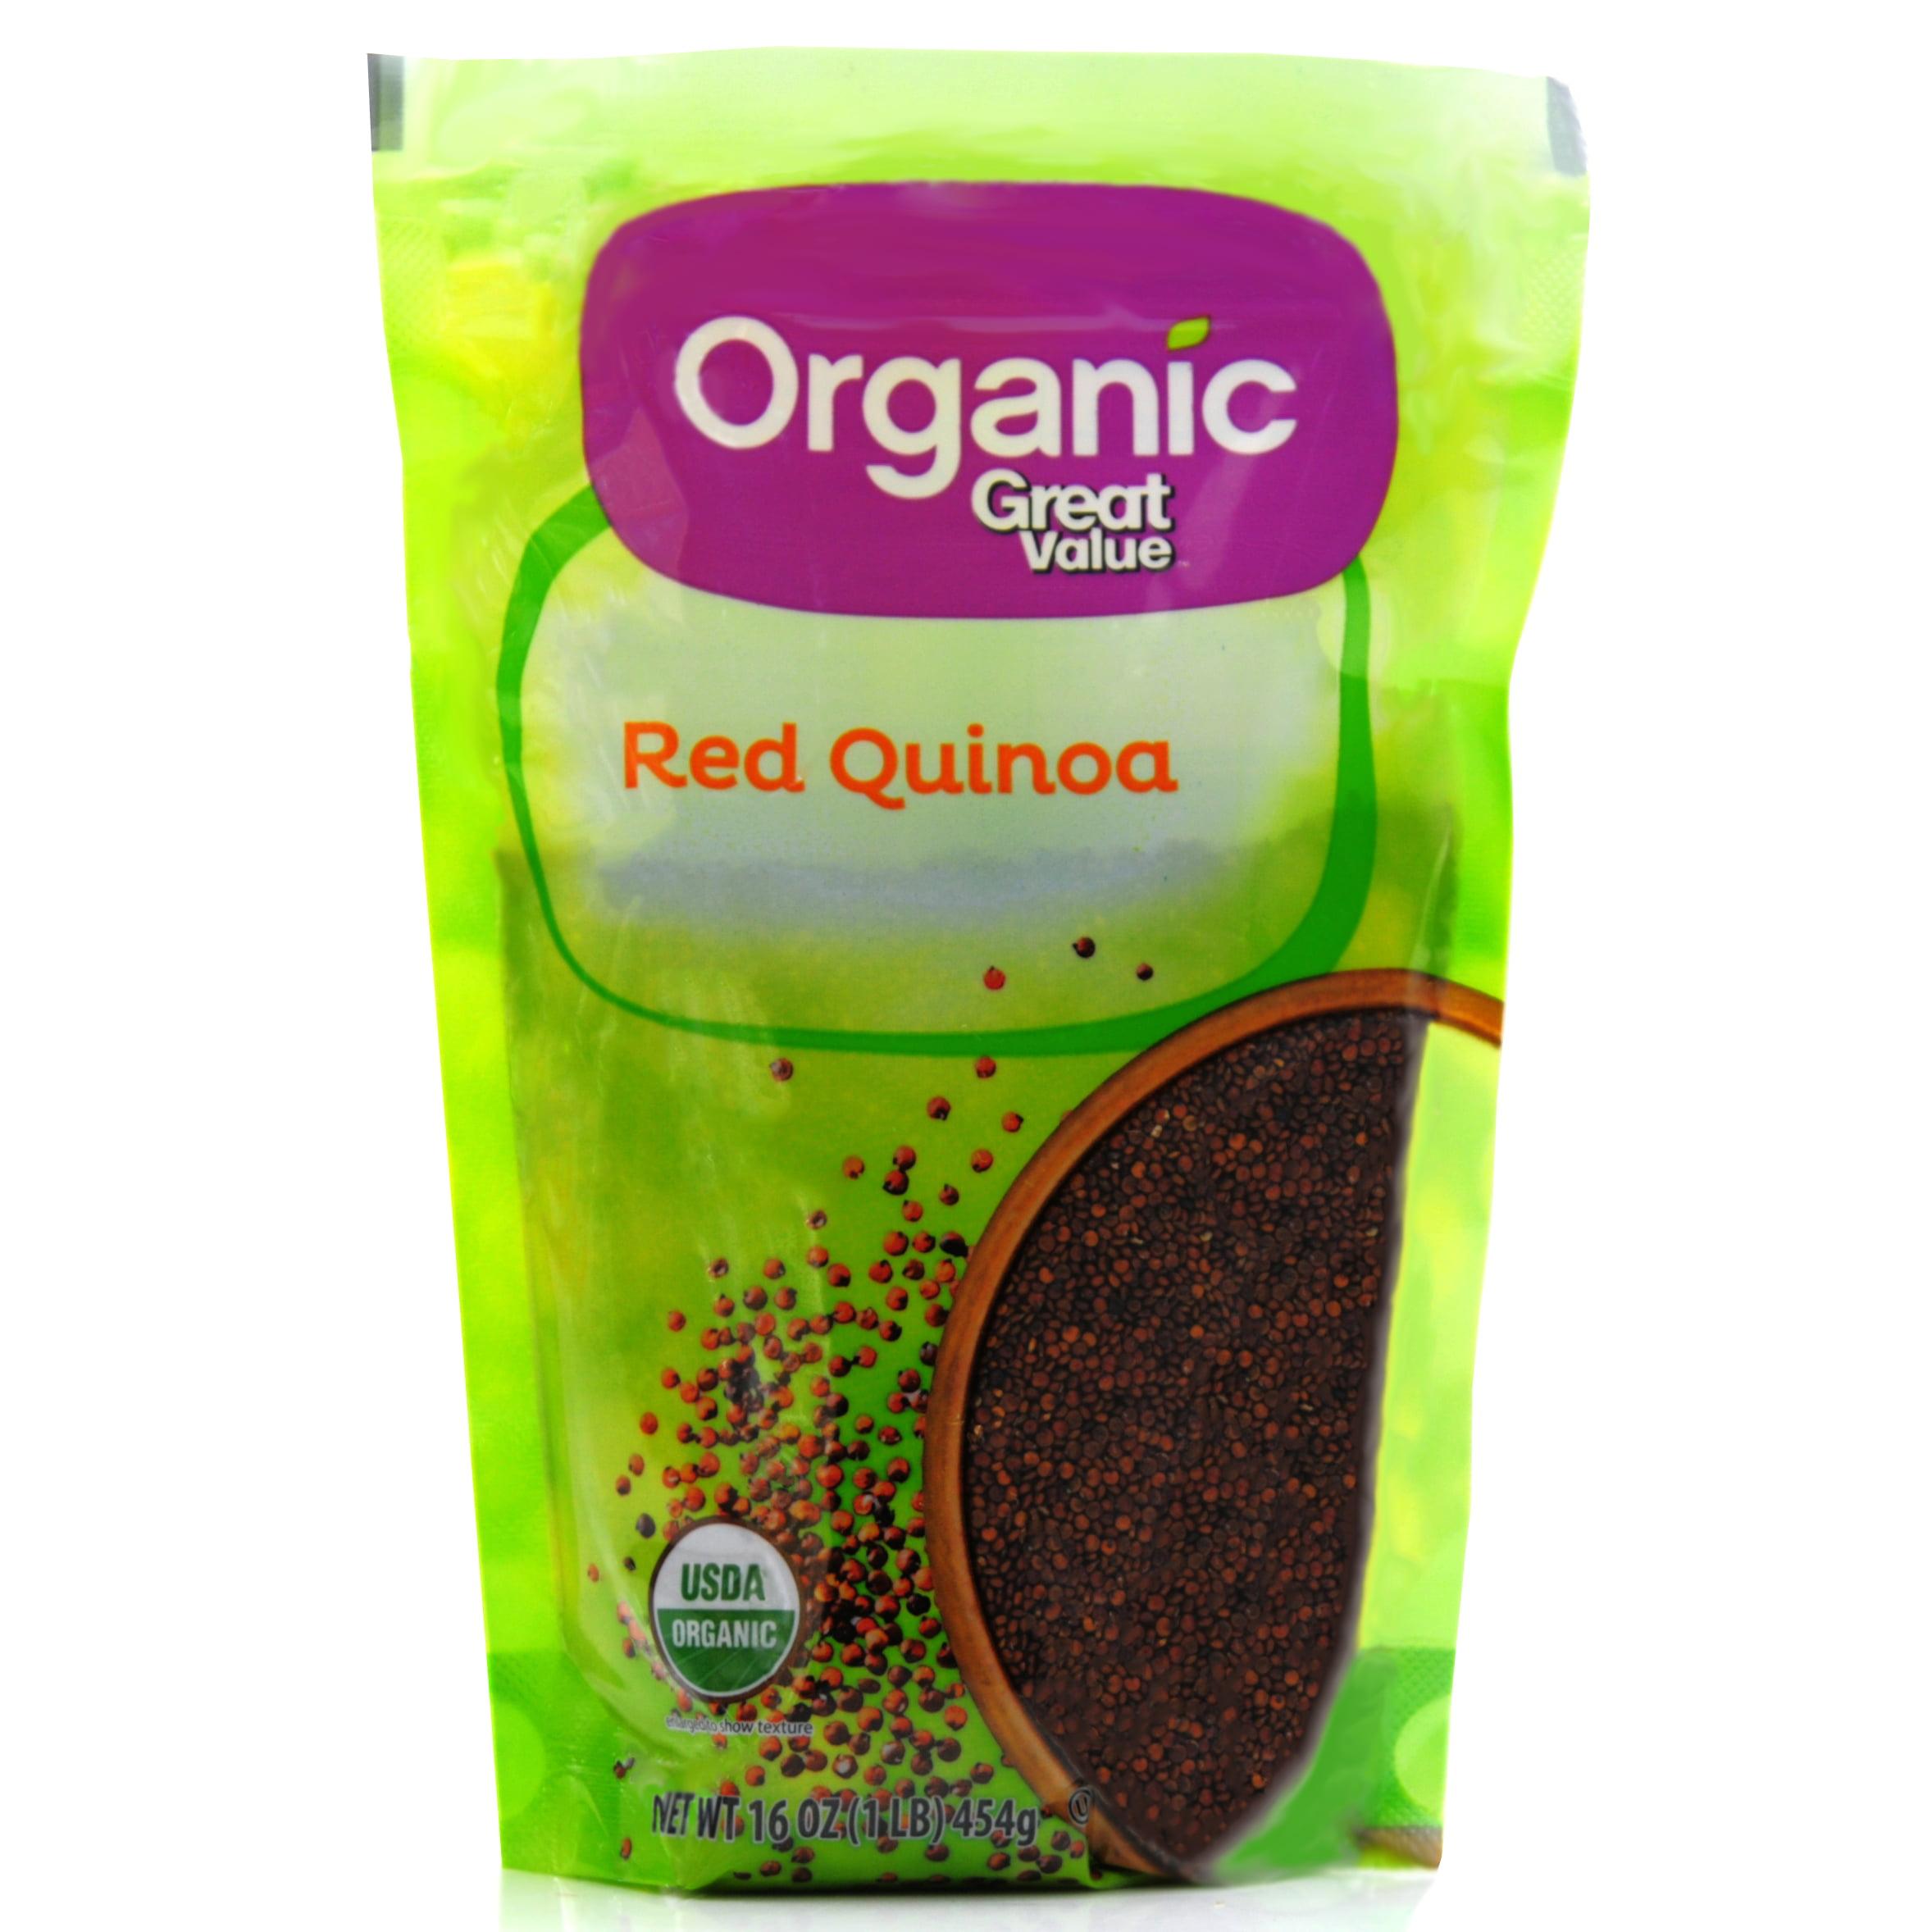 (2 Pack) Great Value Organic Red Quinoa, 16 oz